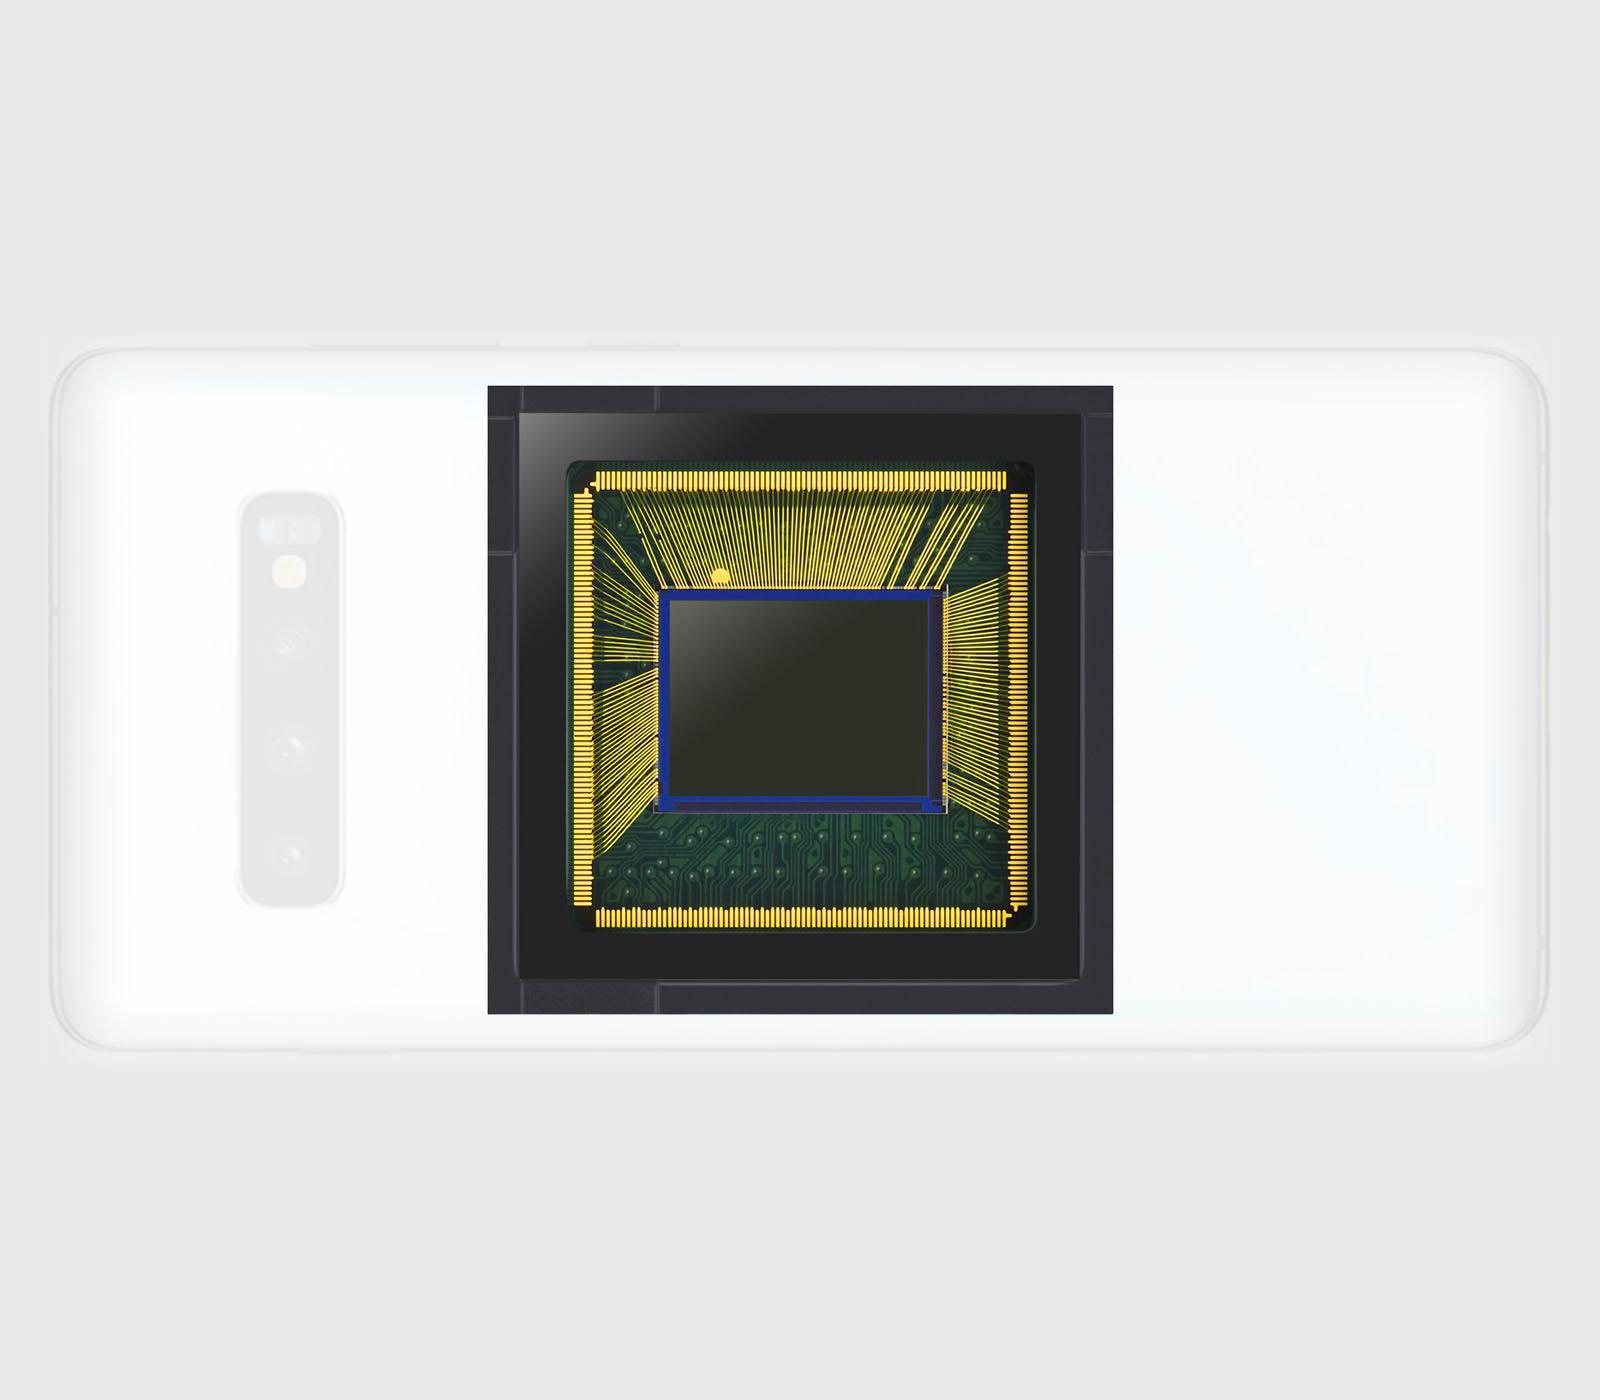 Samsung 64-Megapixel Smartphone Sensor